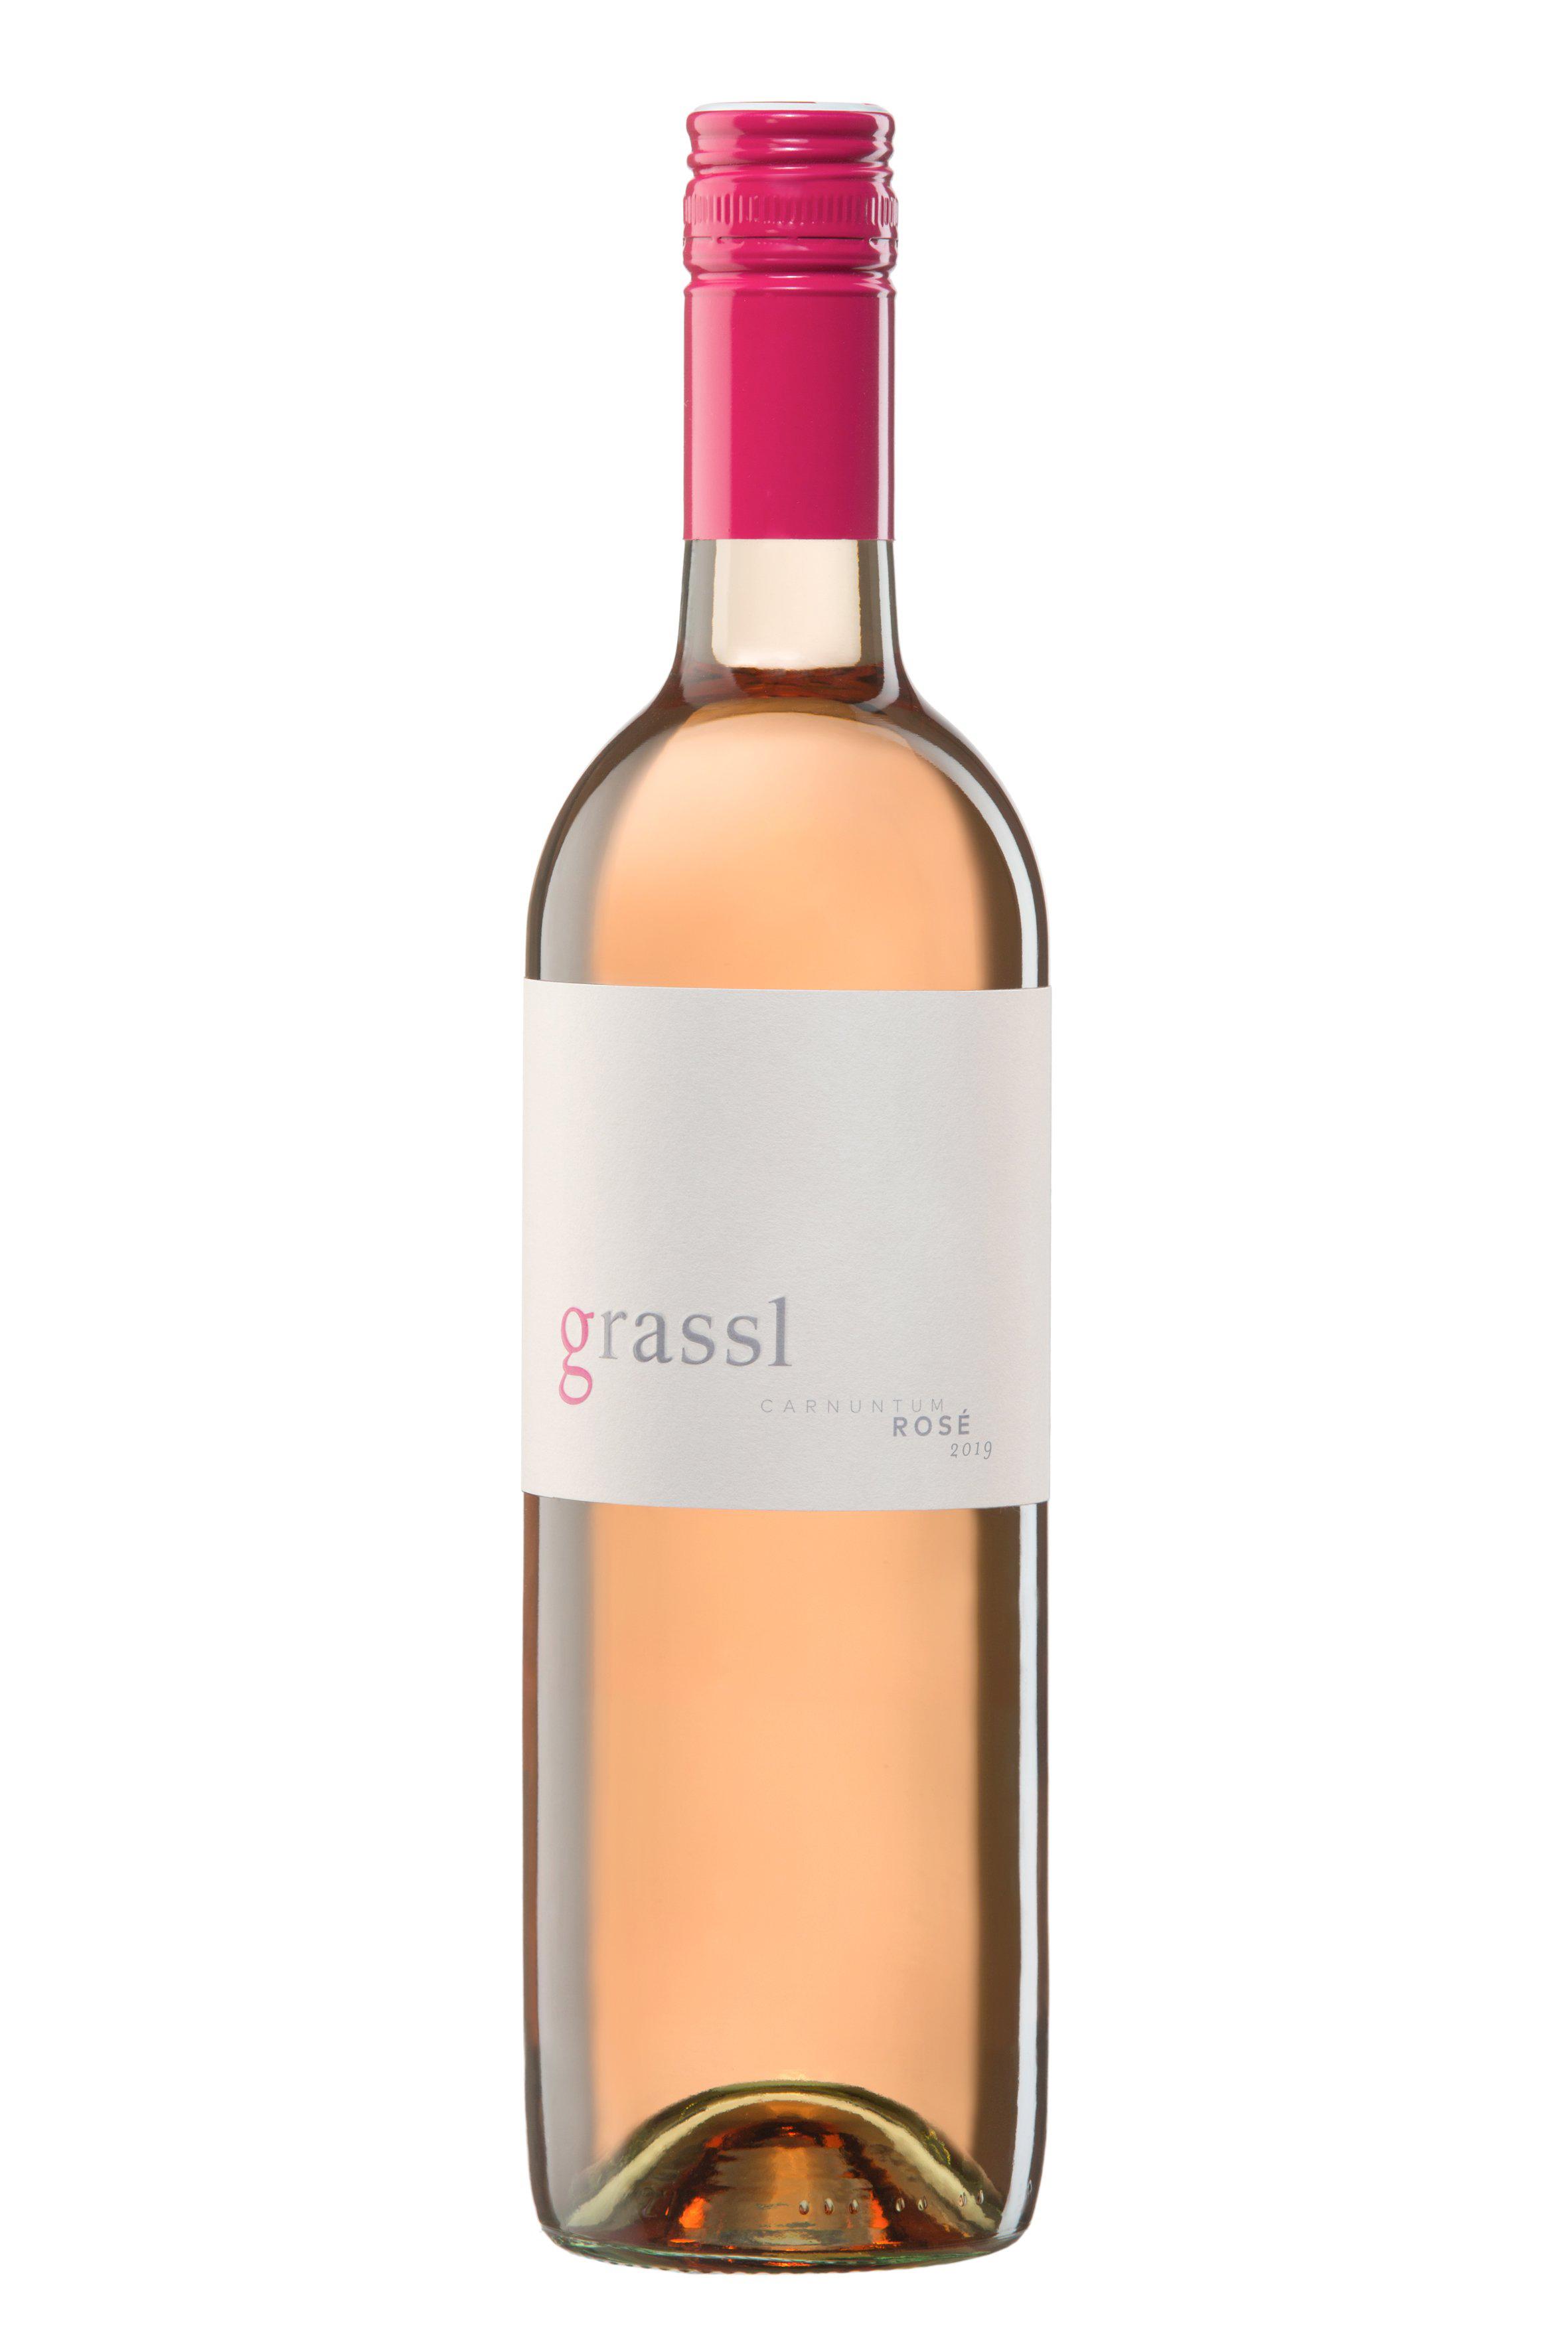 Philipp Grassl Göttlesbrunnn Zweigelt Rose 2019